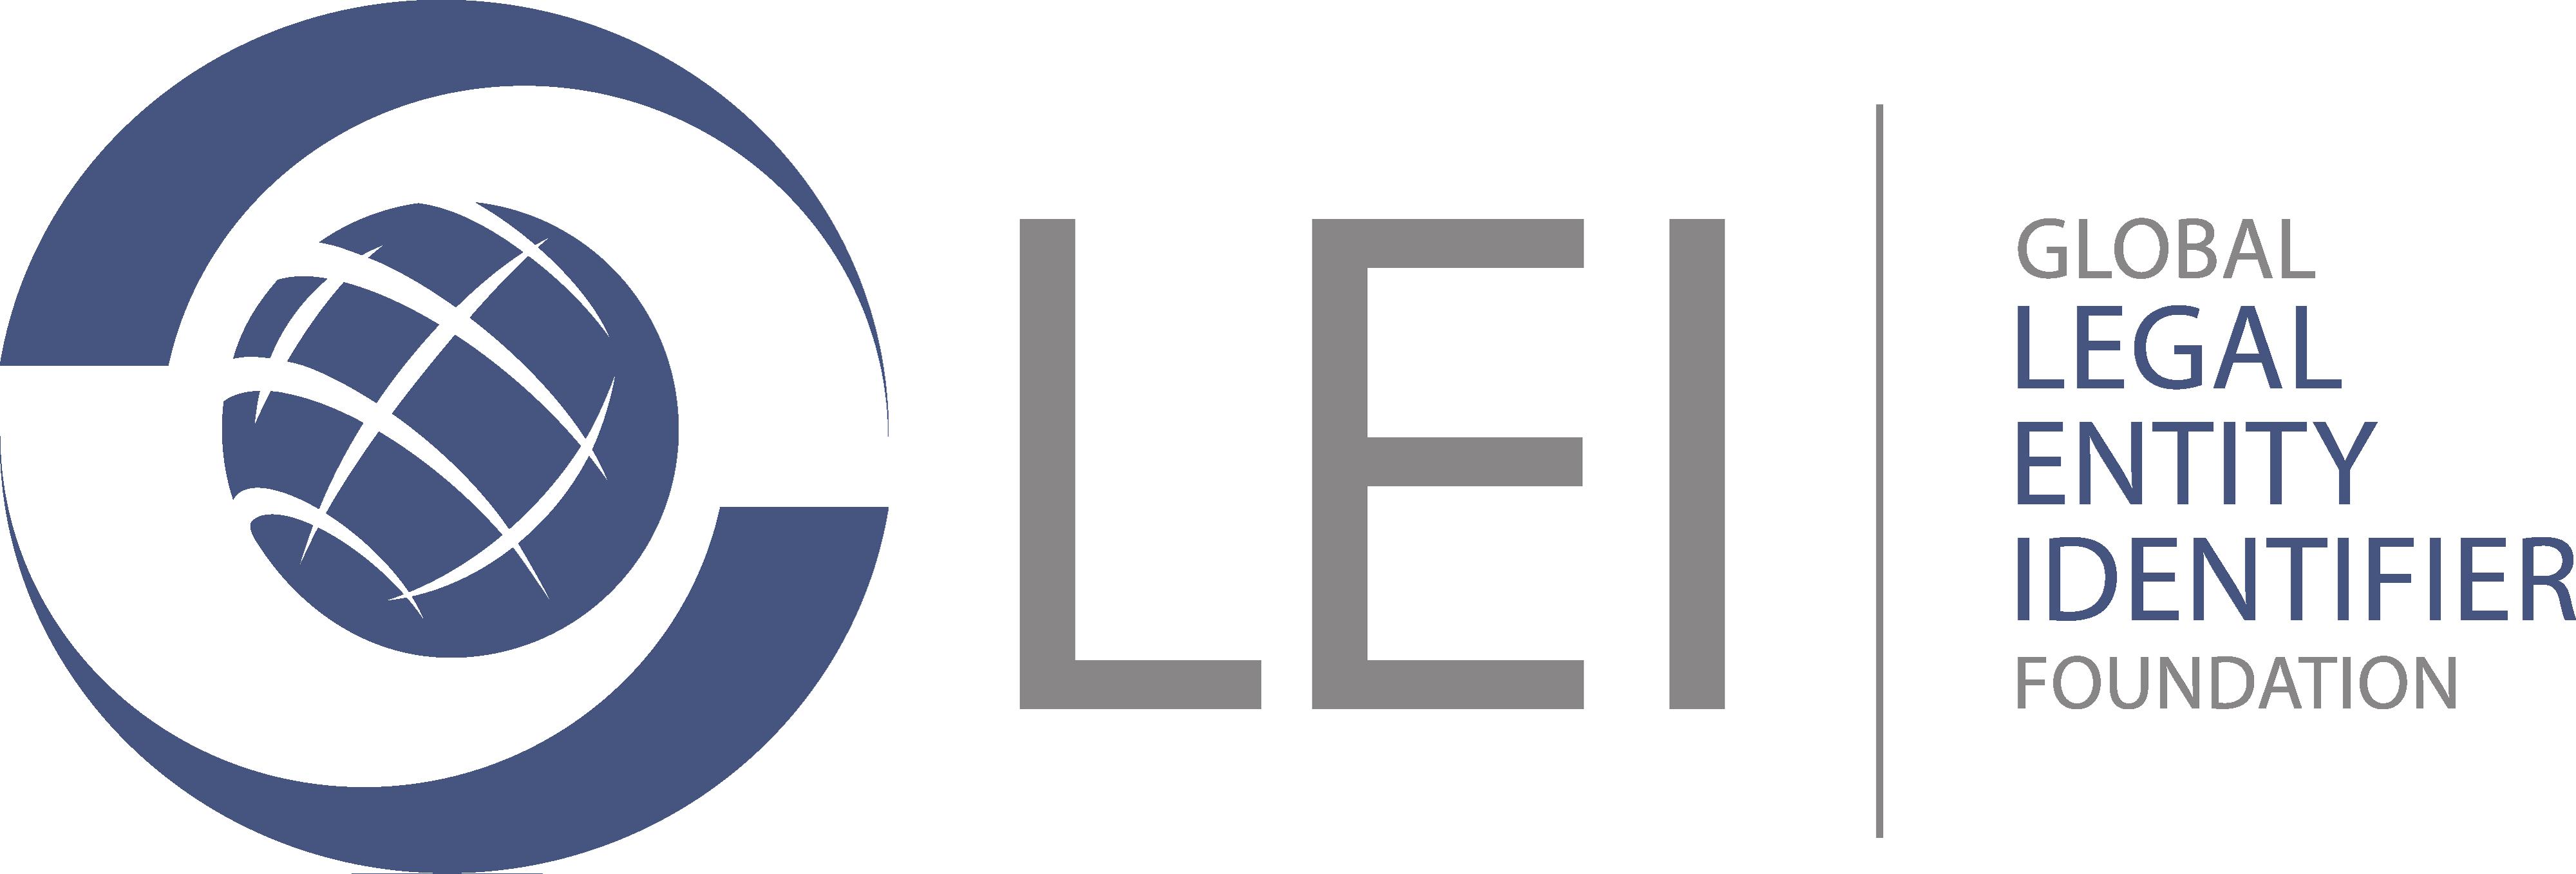 gleif-logo